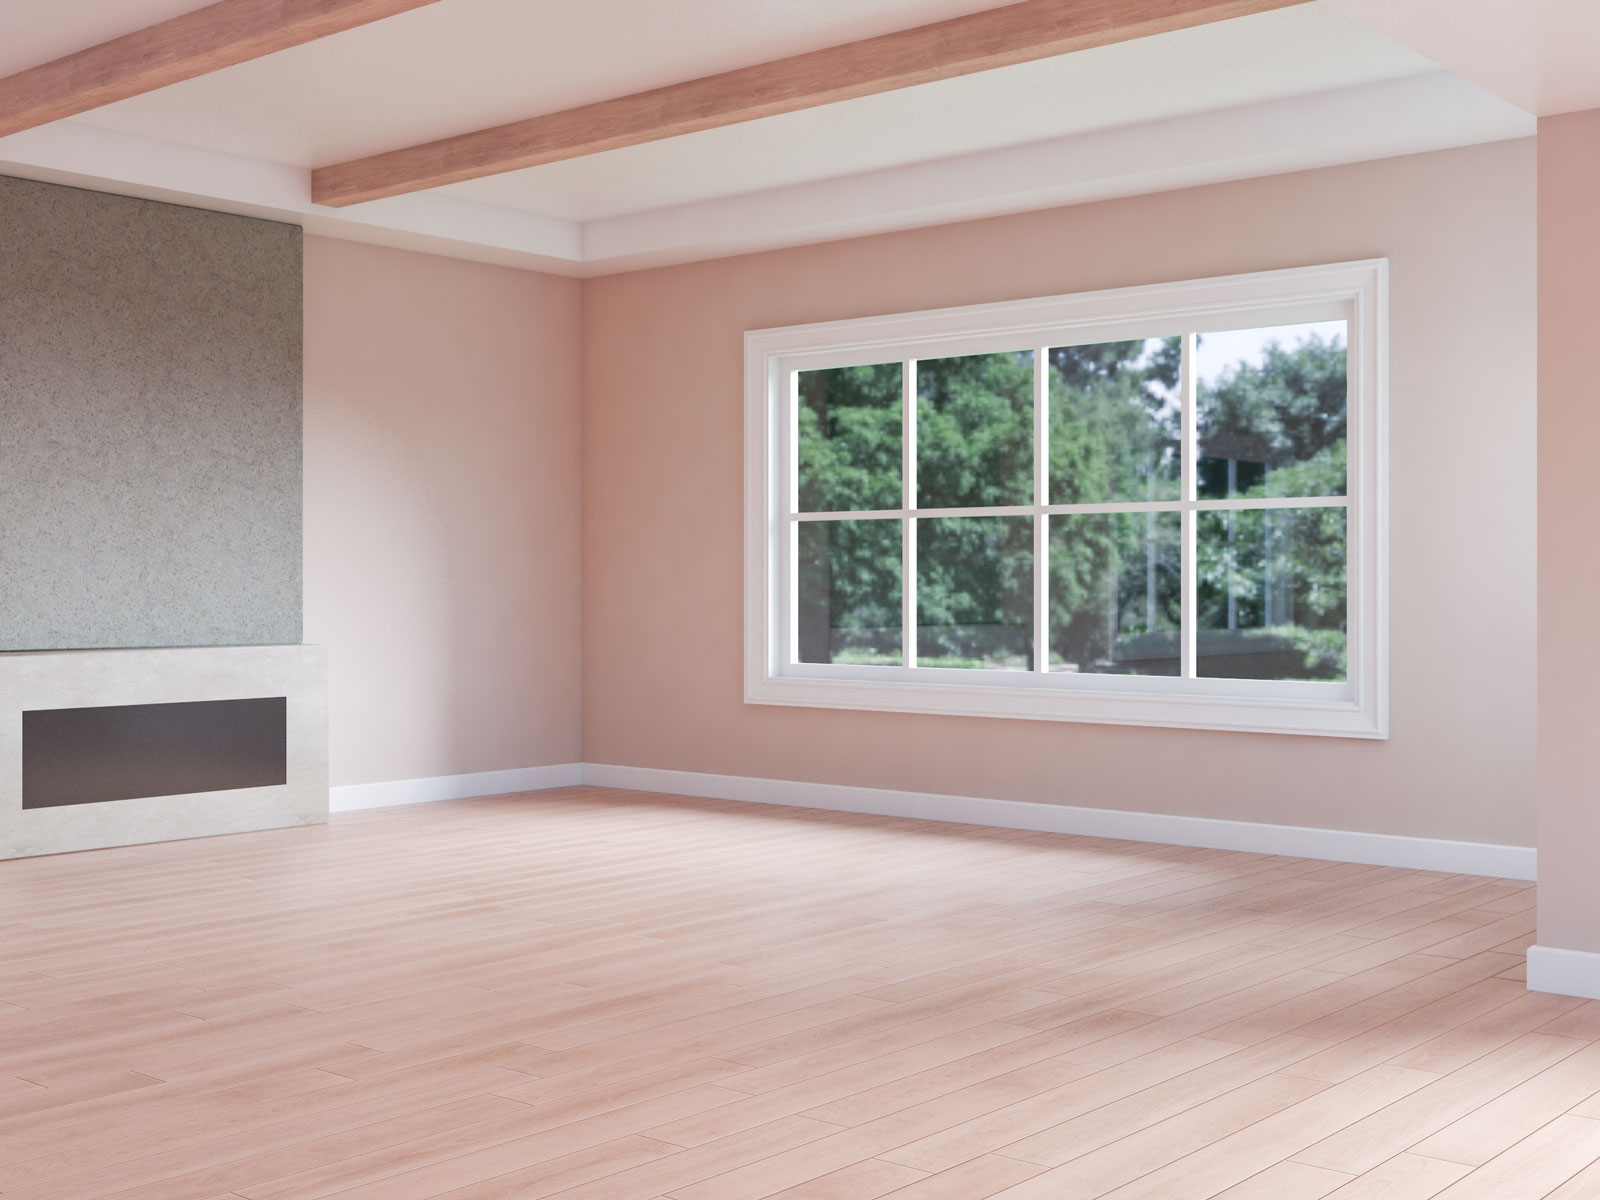 Beige walls with red oakwood flooring